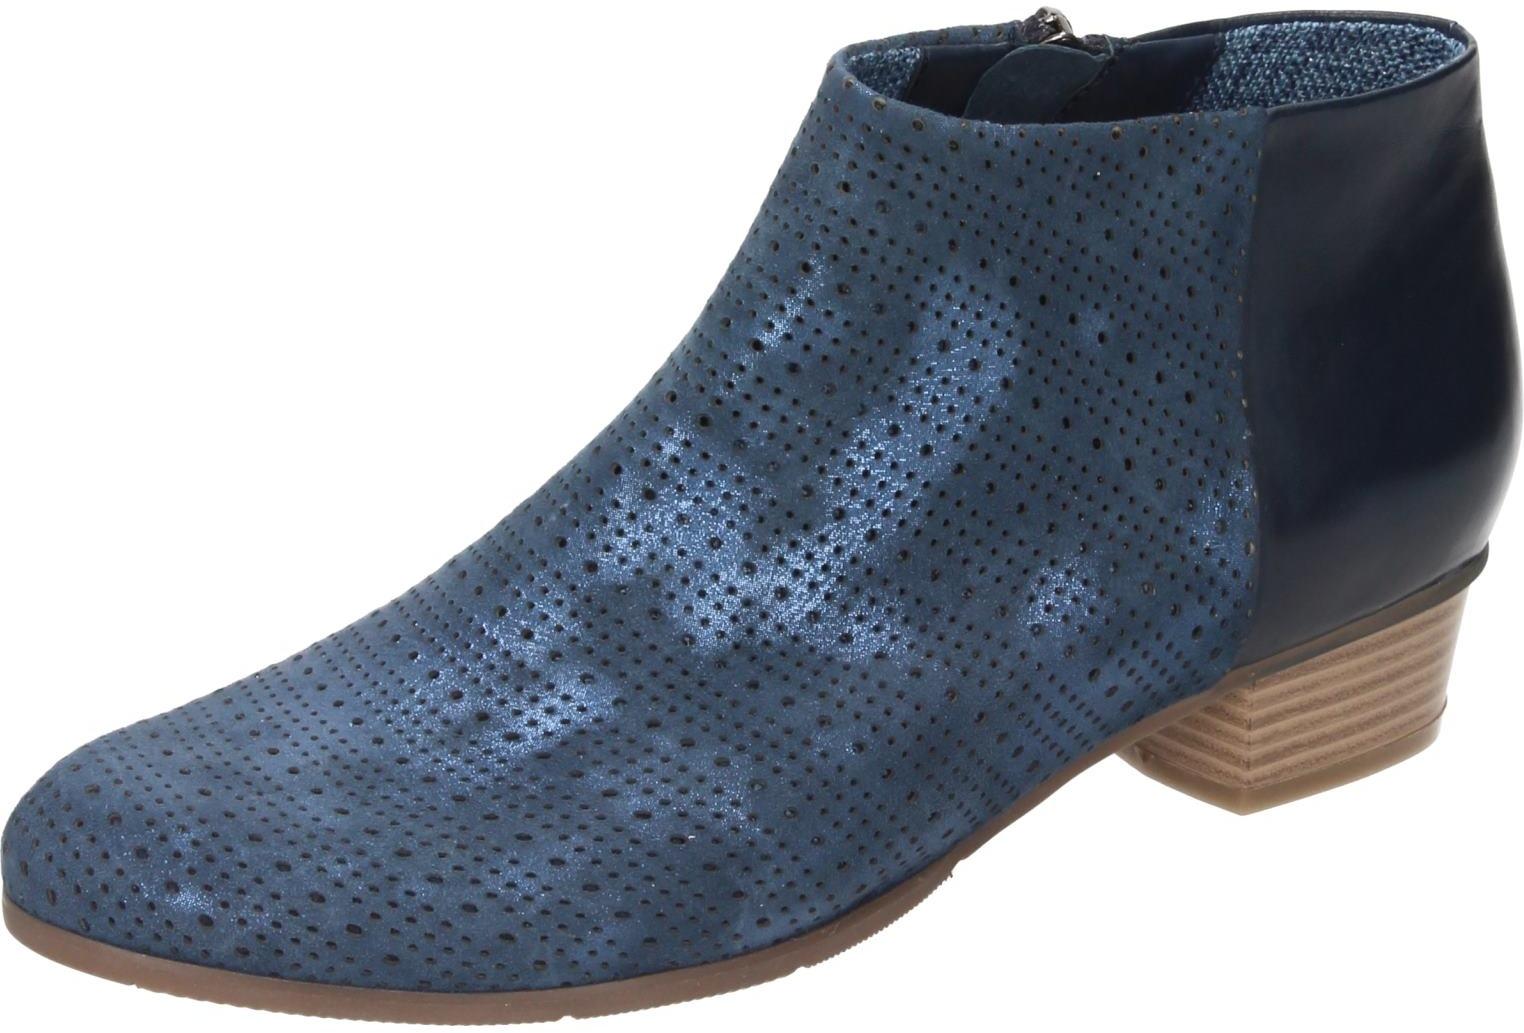 Piazza Damen Schuhe Damen-Stiefelette blau/navy 961837